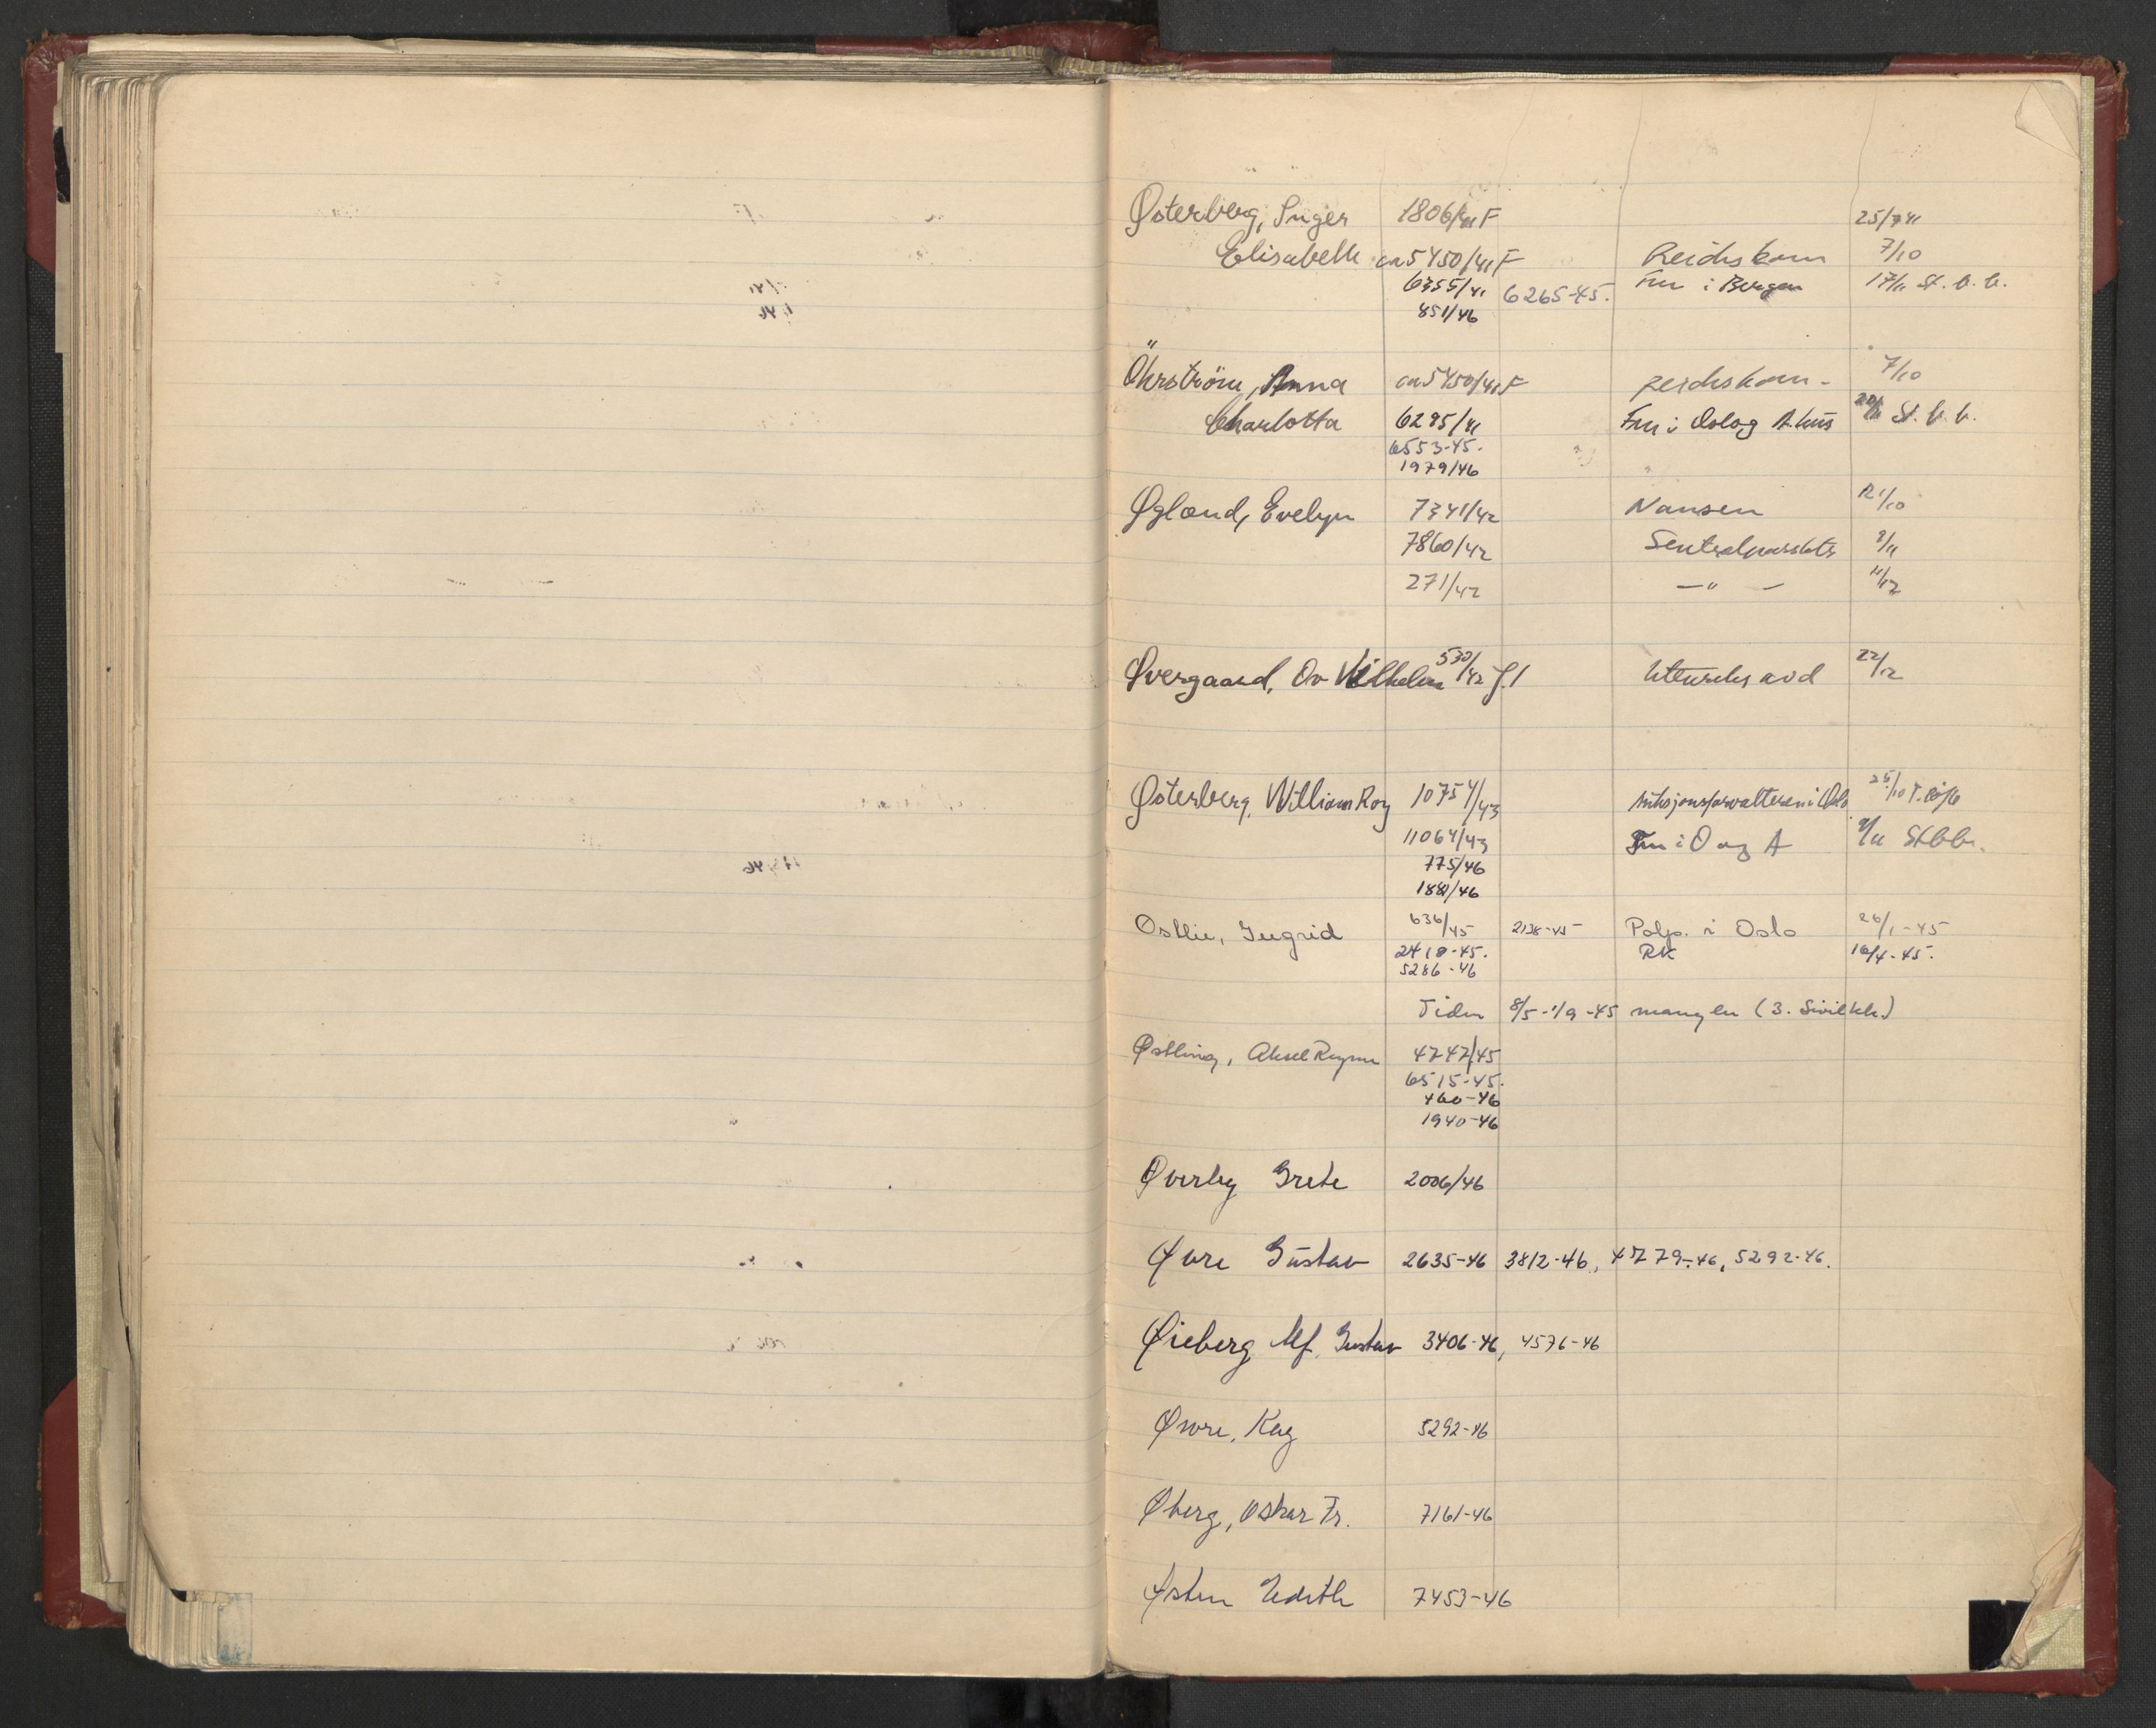 RA, Justisdepartementet, 3. politikontor P3, C/Cc/L0002: Journalregister over statsborgersaker, 1940-1946, s. 113